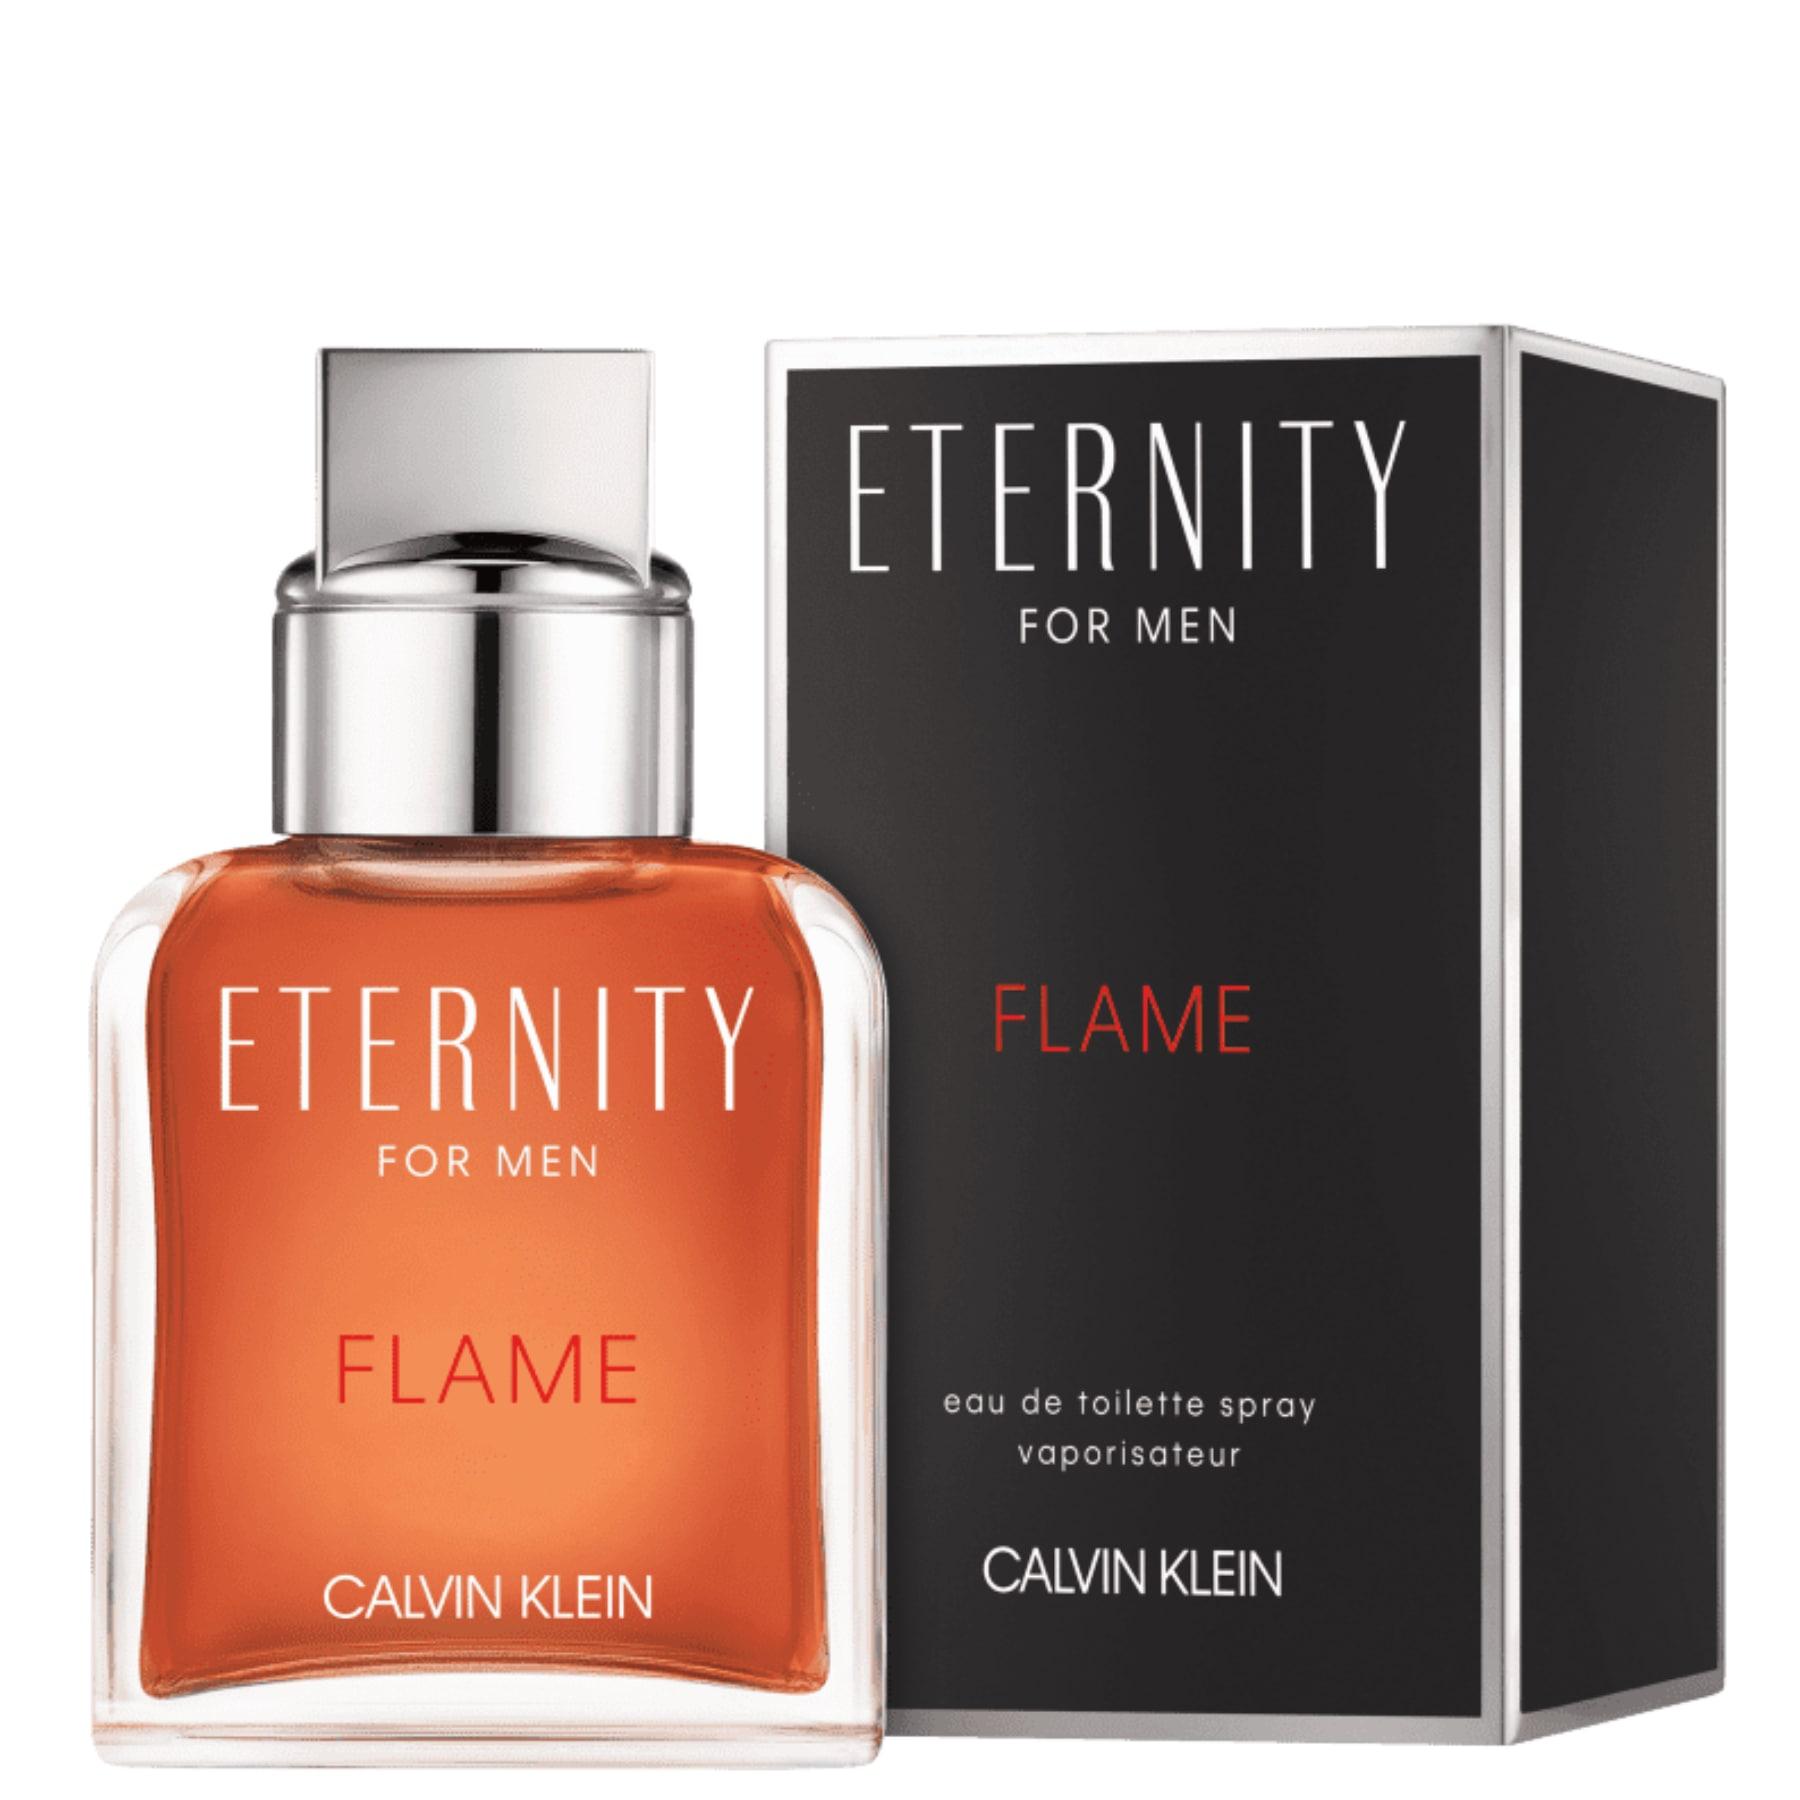 Calvin Klein Eternity Flame for Men Eau de Toilette Calvin Klein 30ml